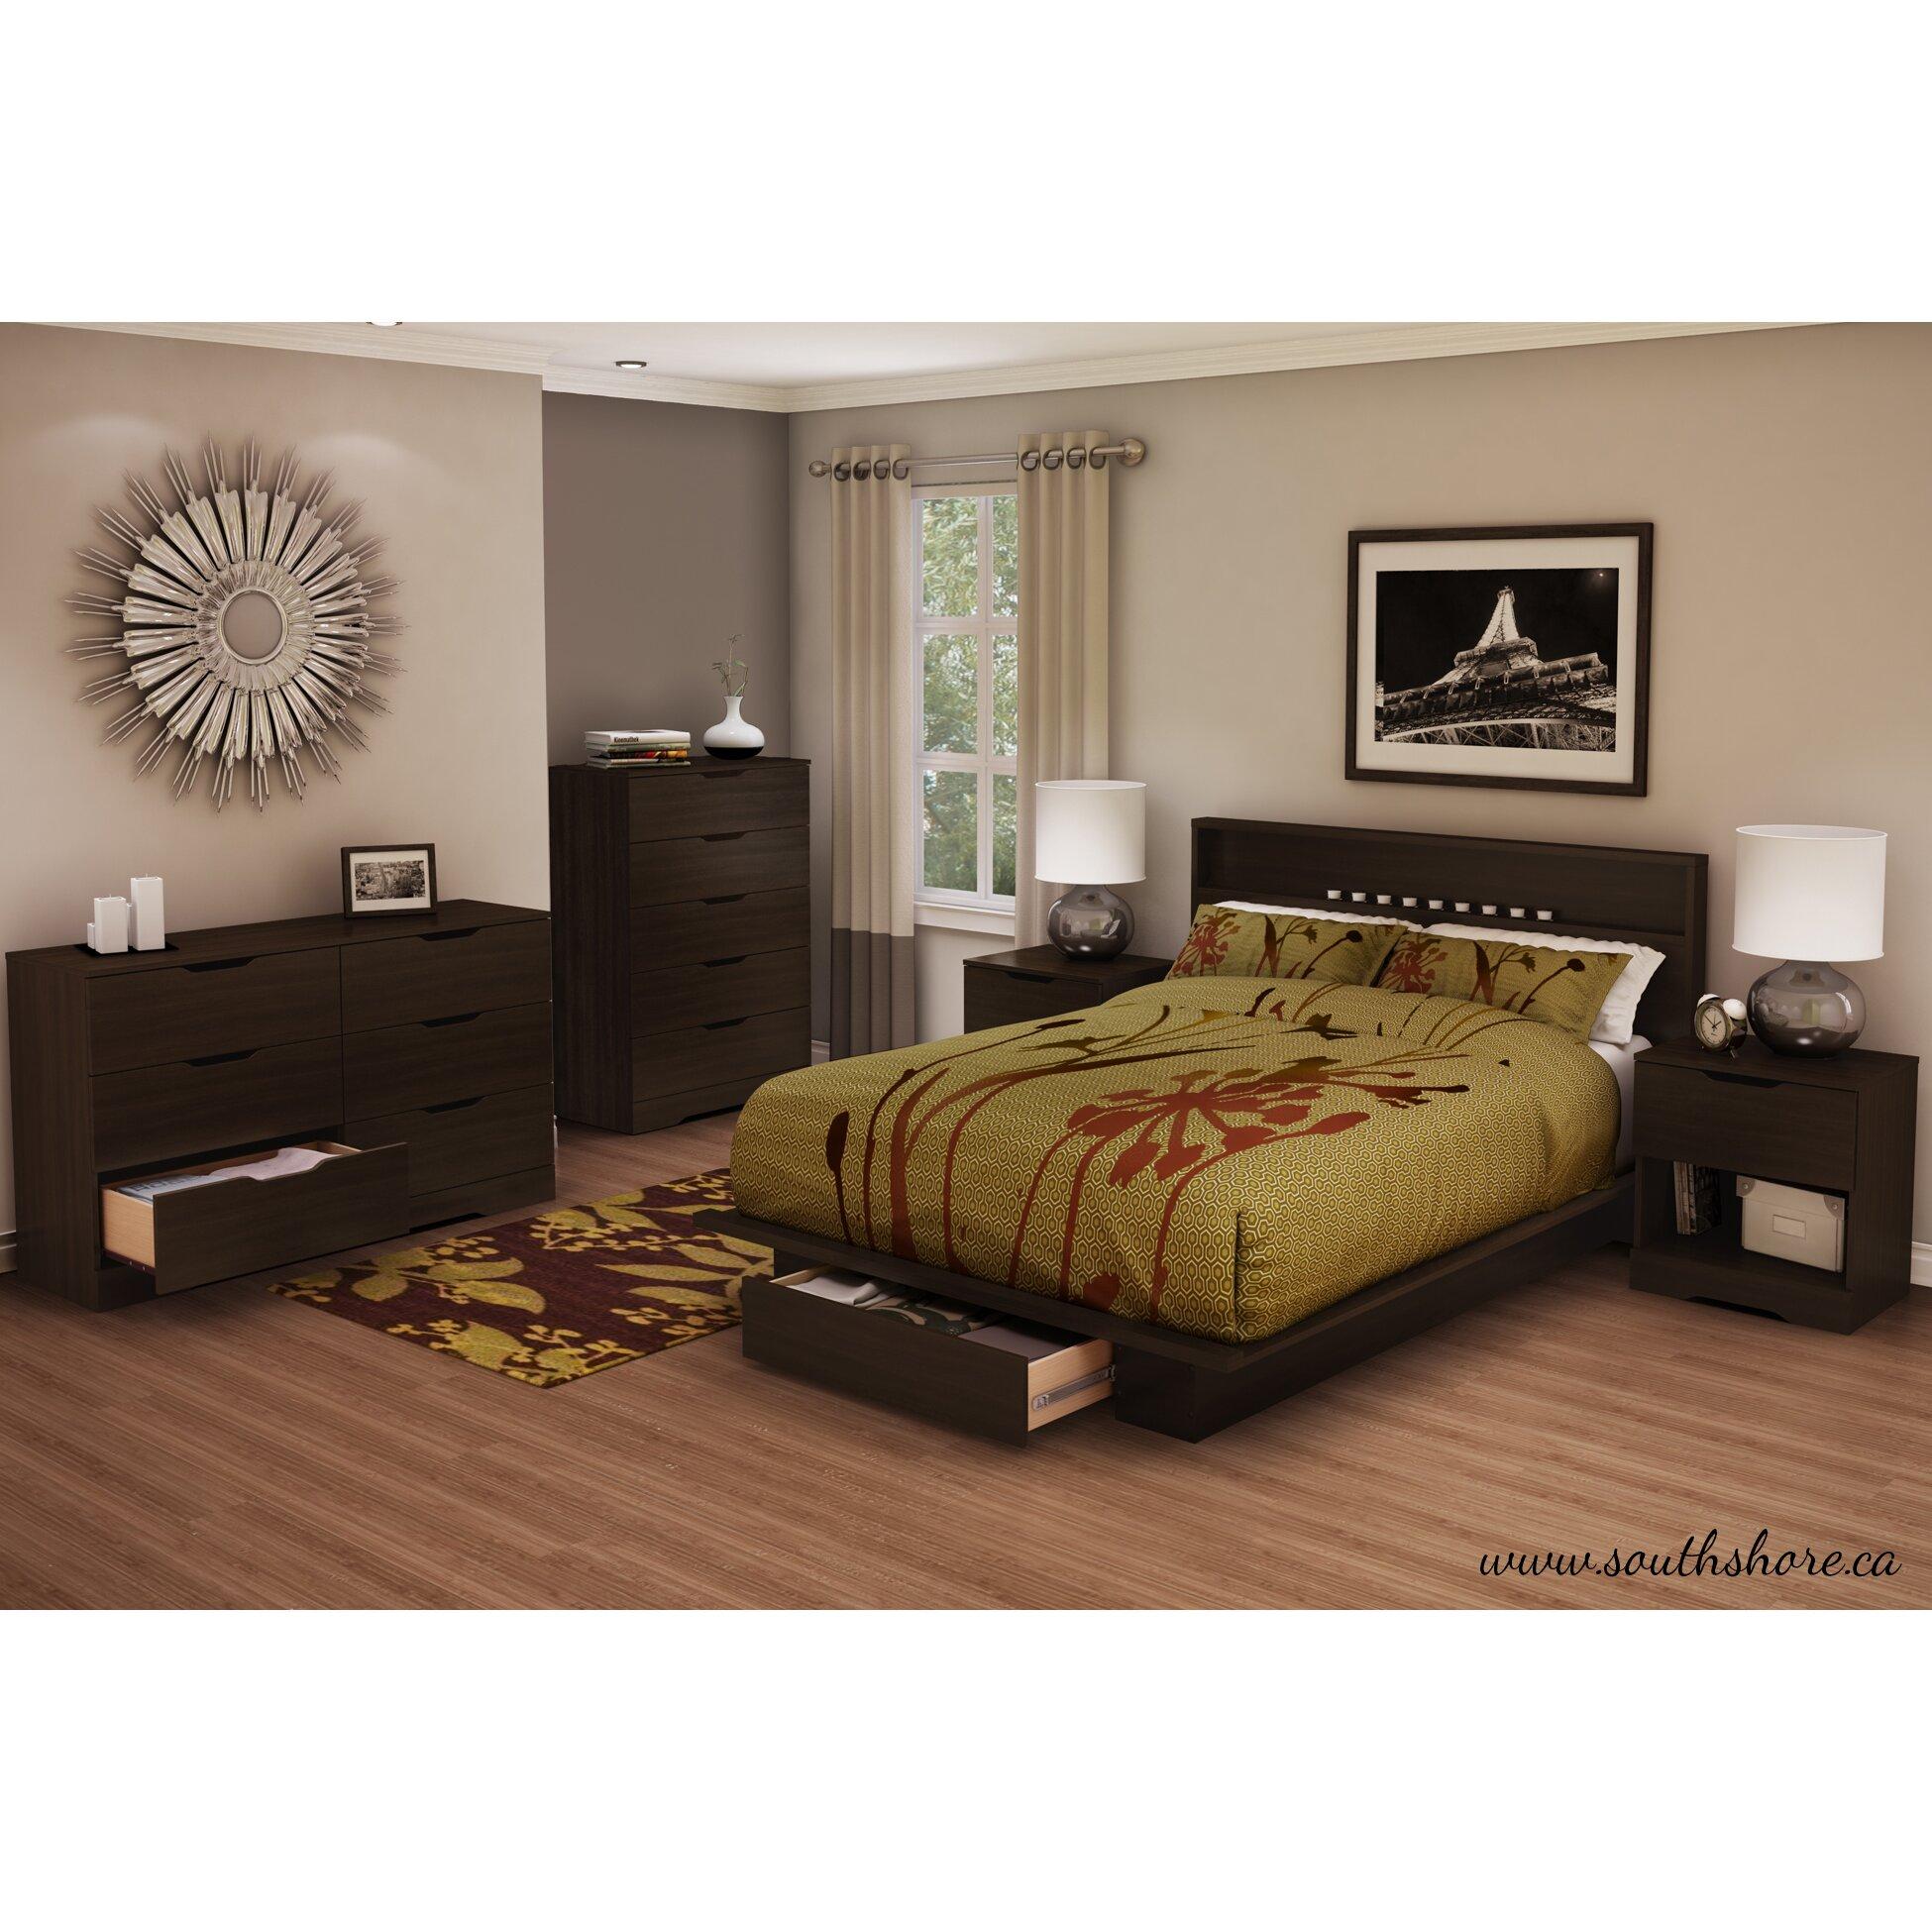 south shore holland 5 drawer chest reviews wayfair. Black Bedroom Furniture Sets. Home Design Ideas